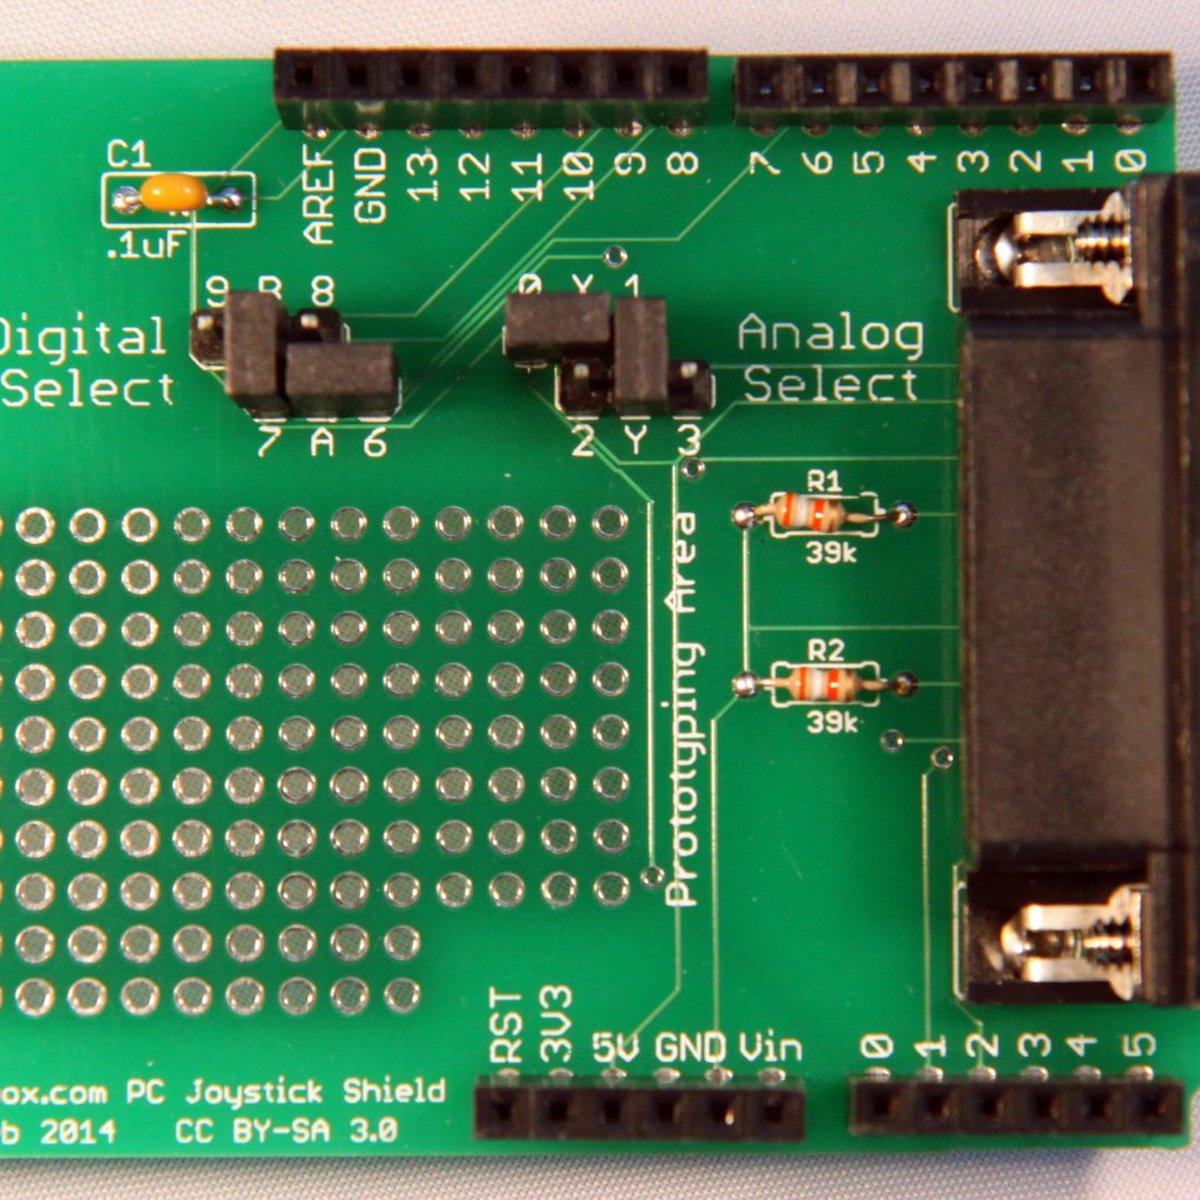 Arduino Joystick Shield for DB15 PC Joysticks from Lectrobox